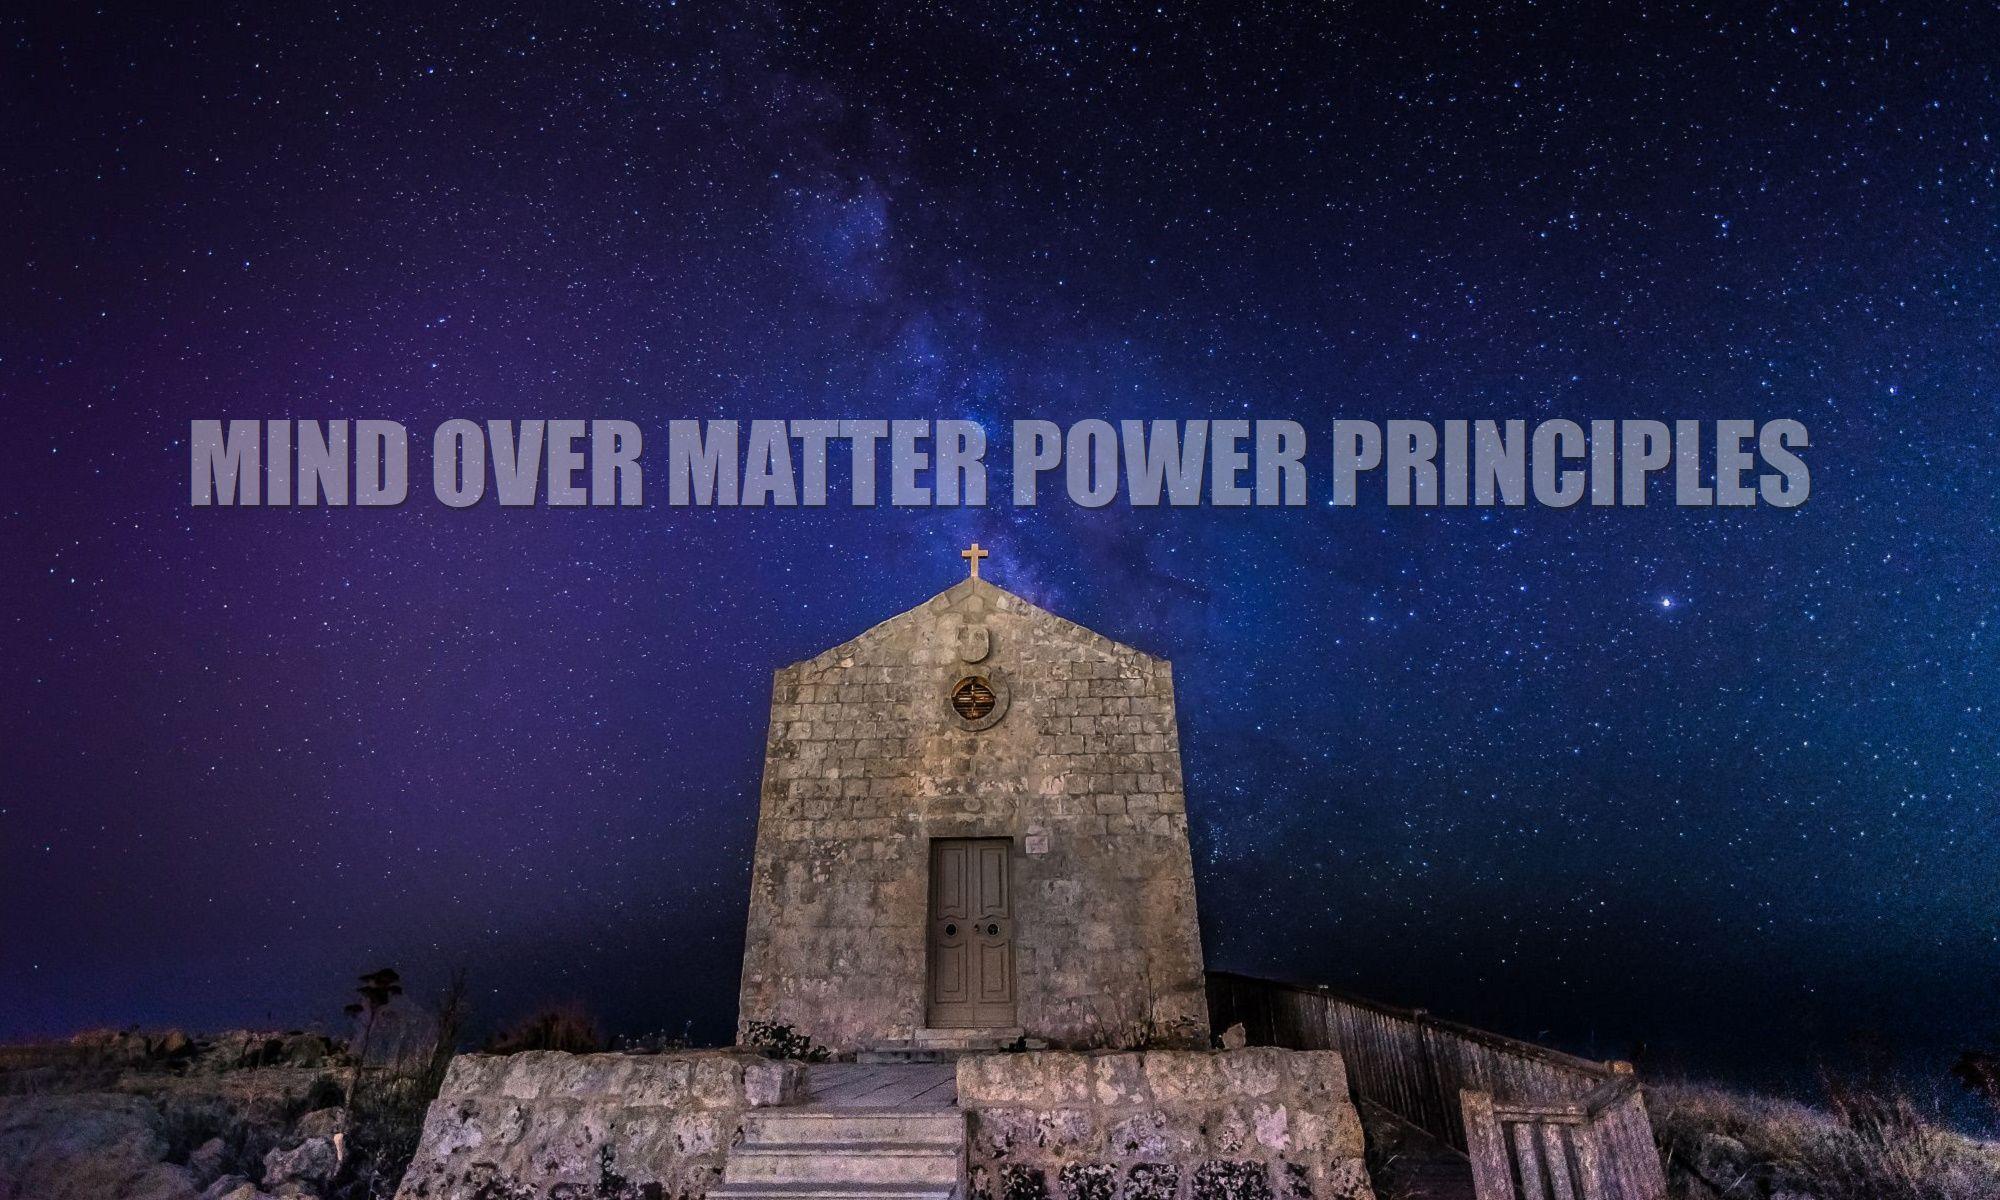 mind-over-matter-power-principles